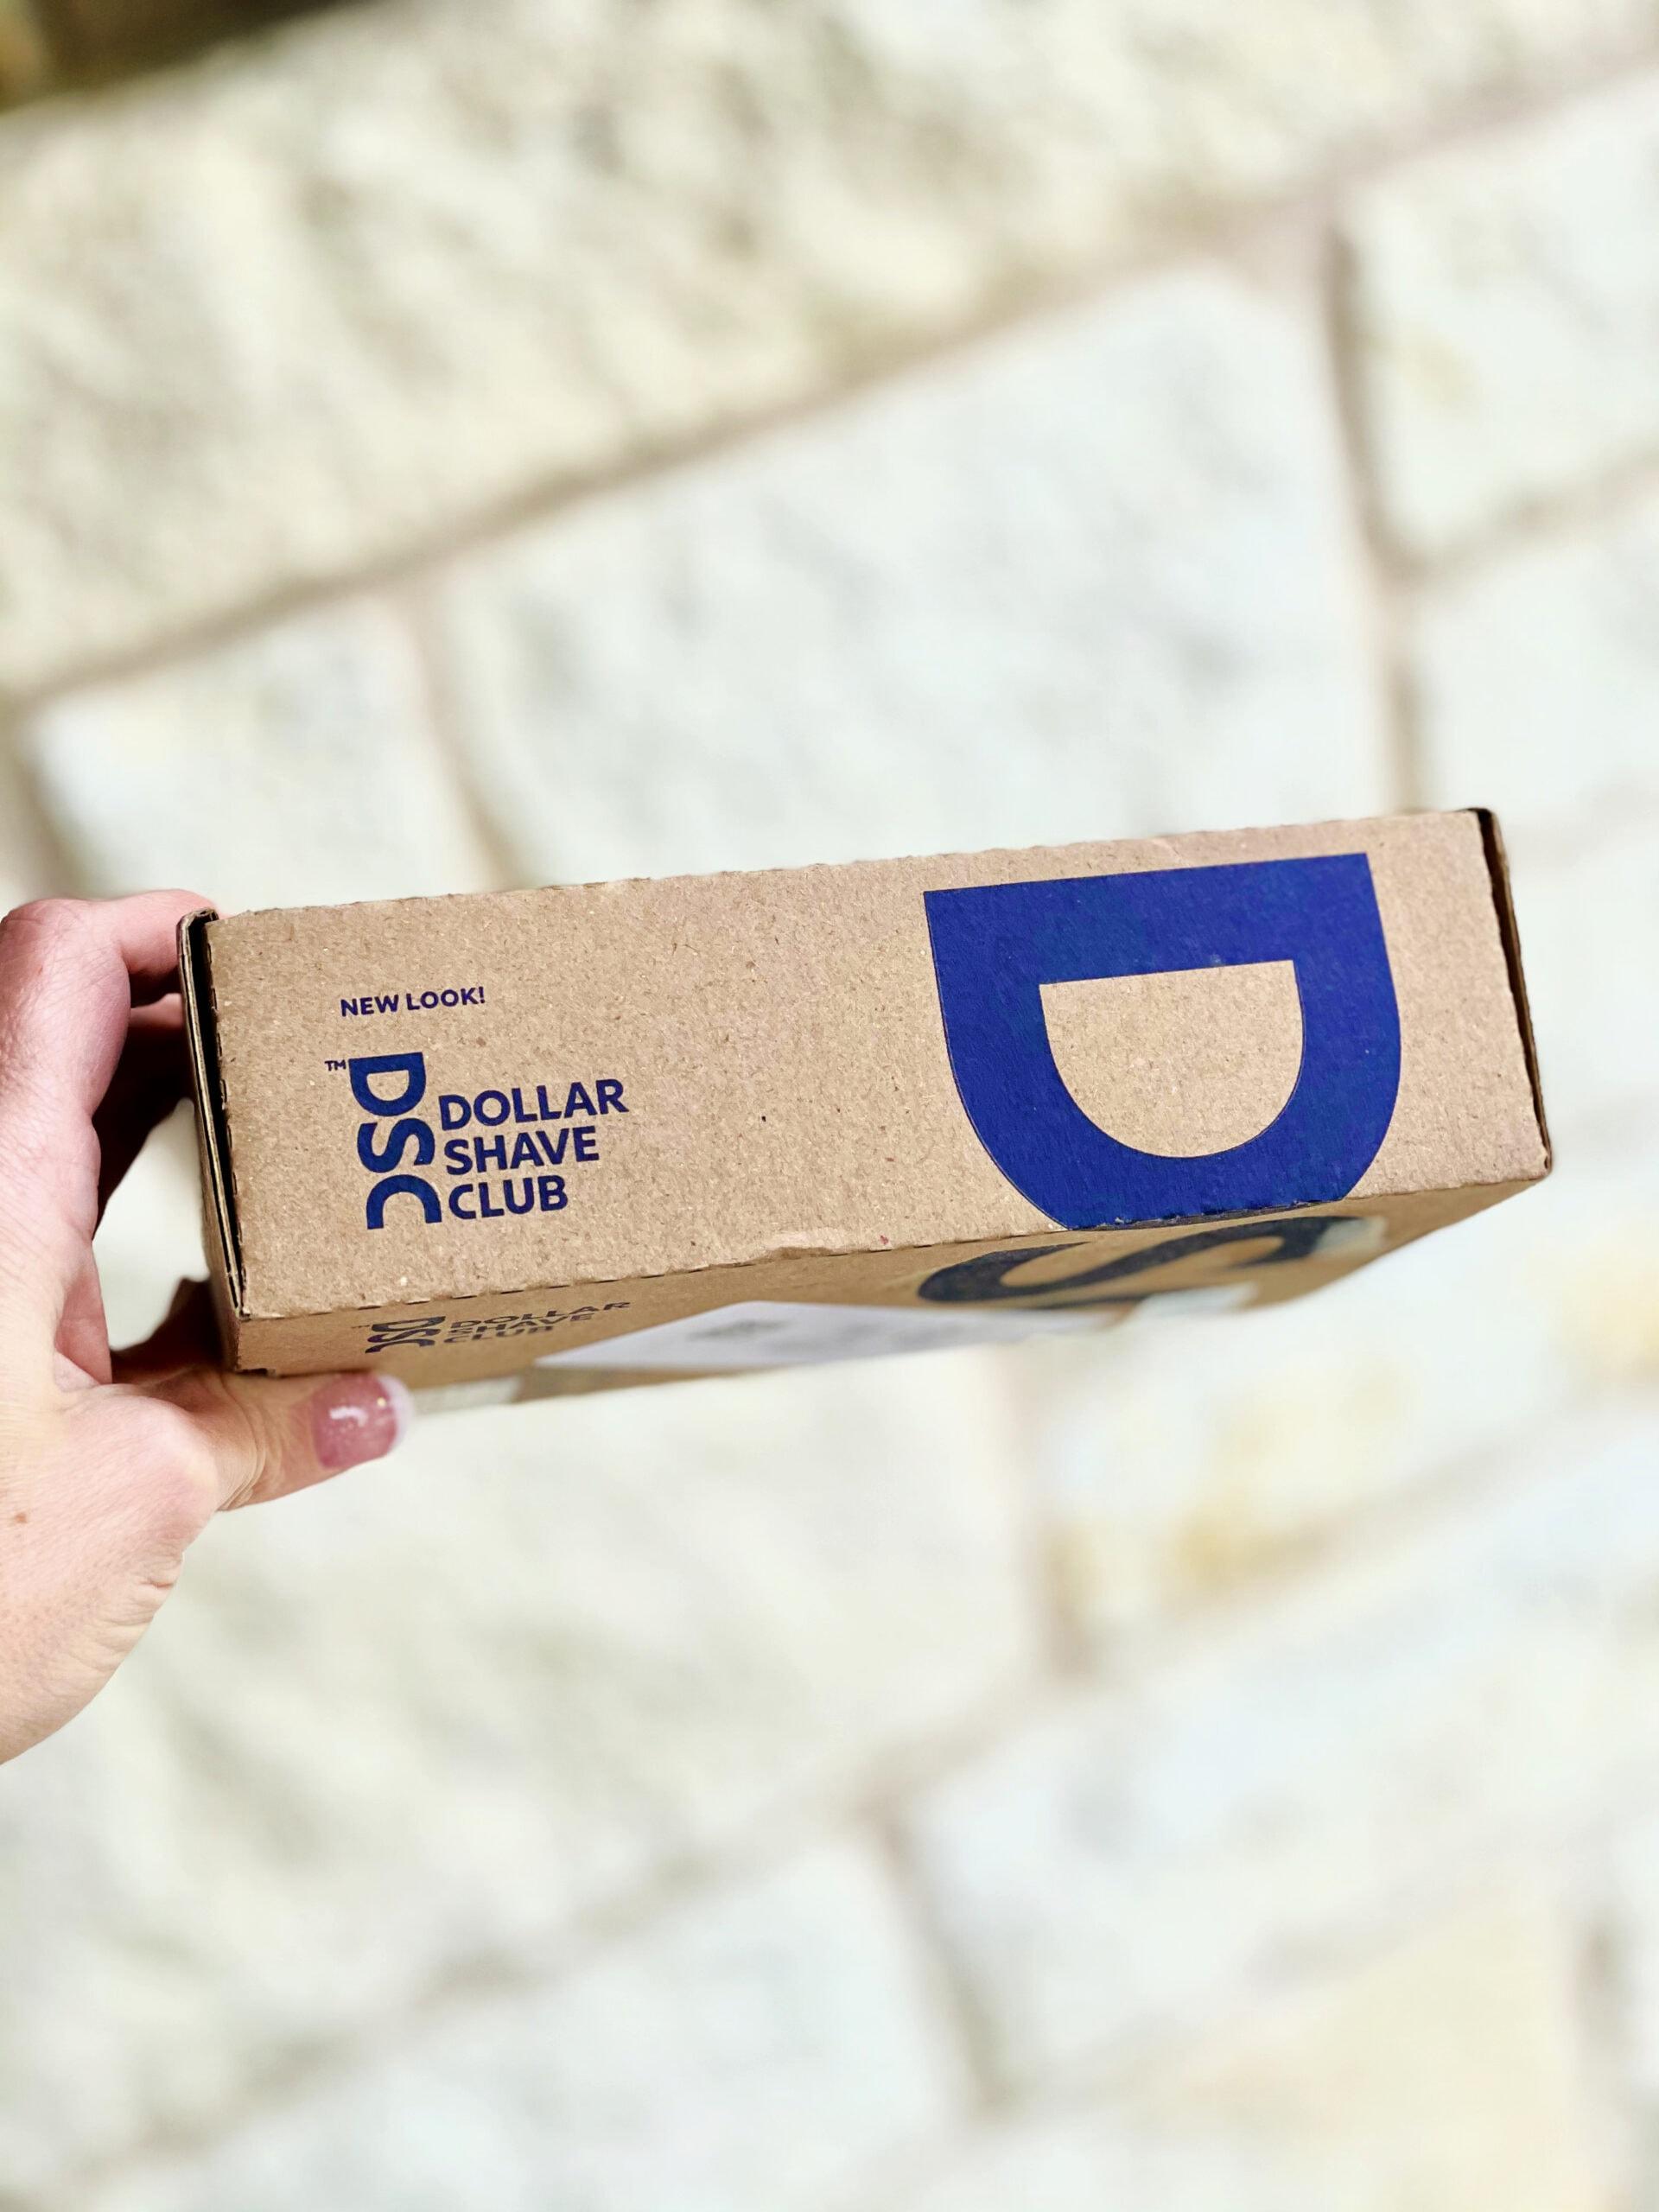 dollar shave club box